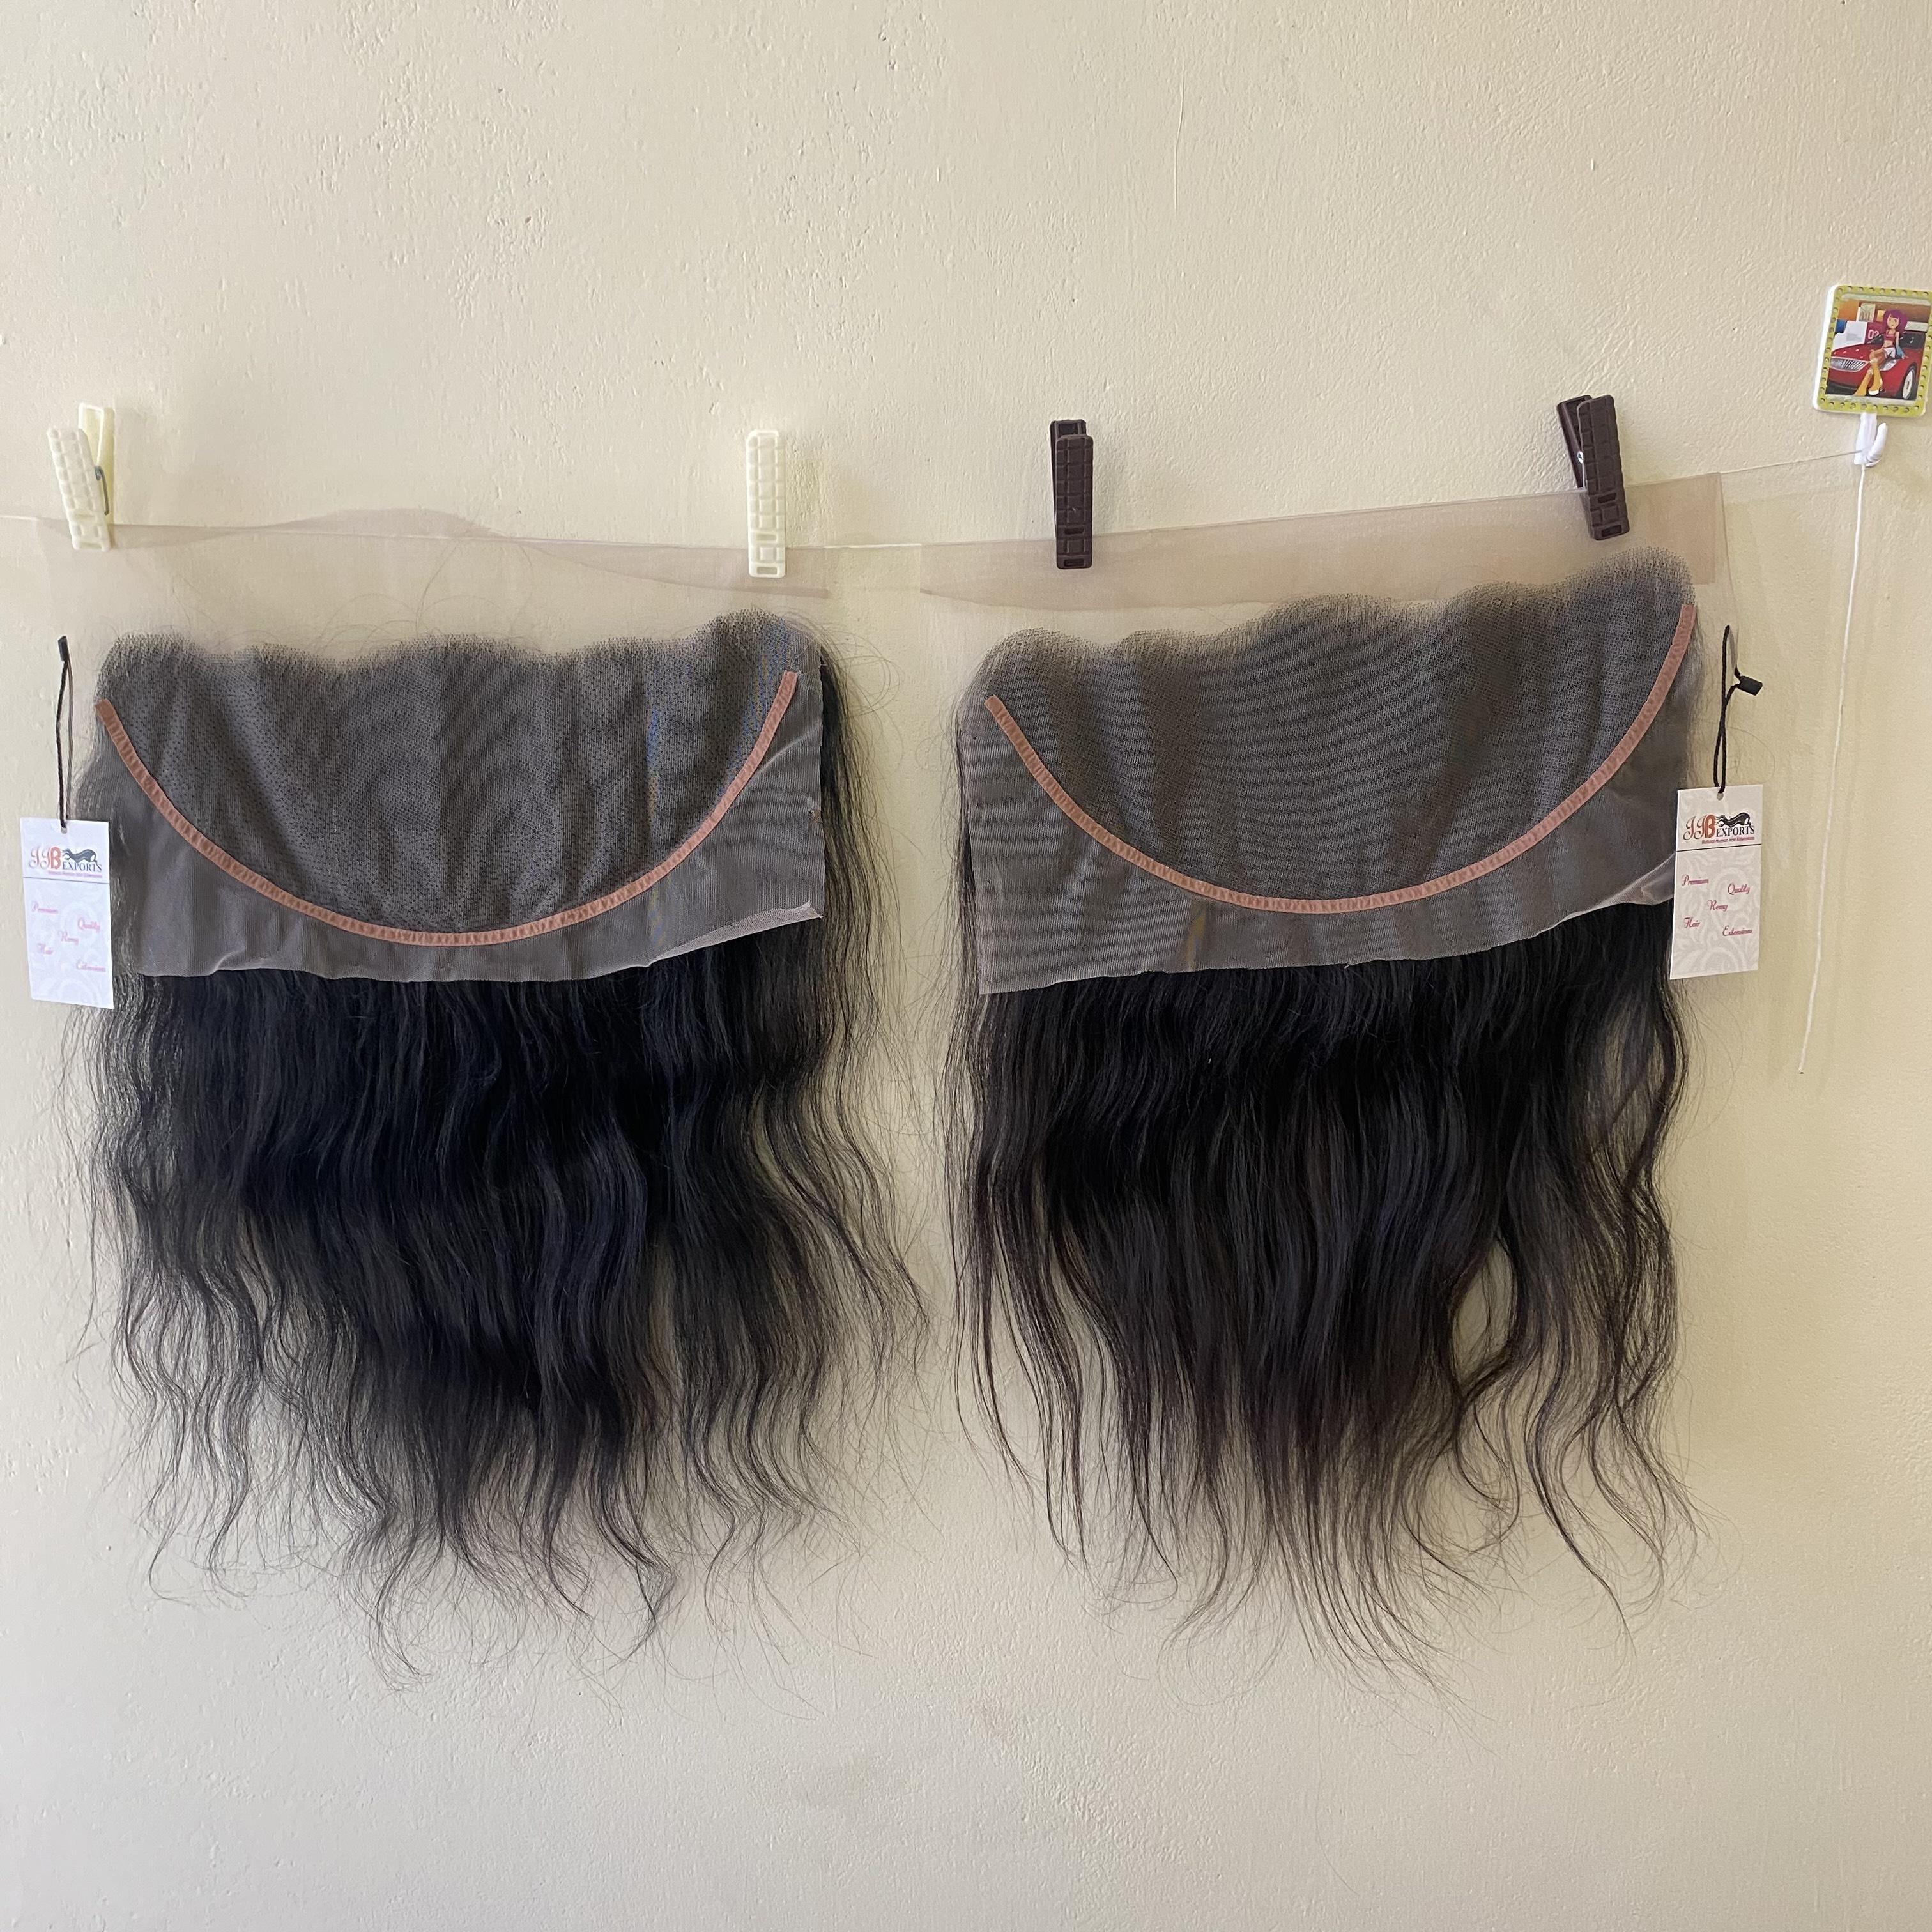 Natural Raw Virgin Hd Lace Closure Frontal 4x4 13x4 Human Brazilian Hair